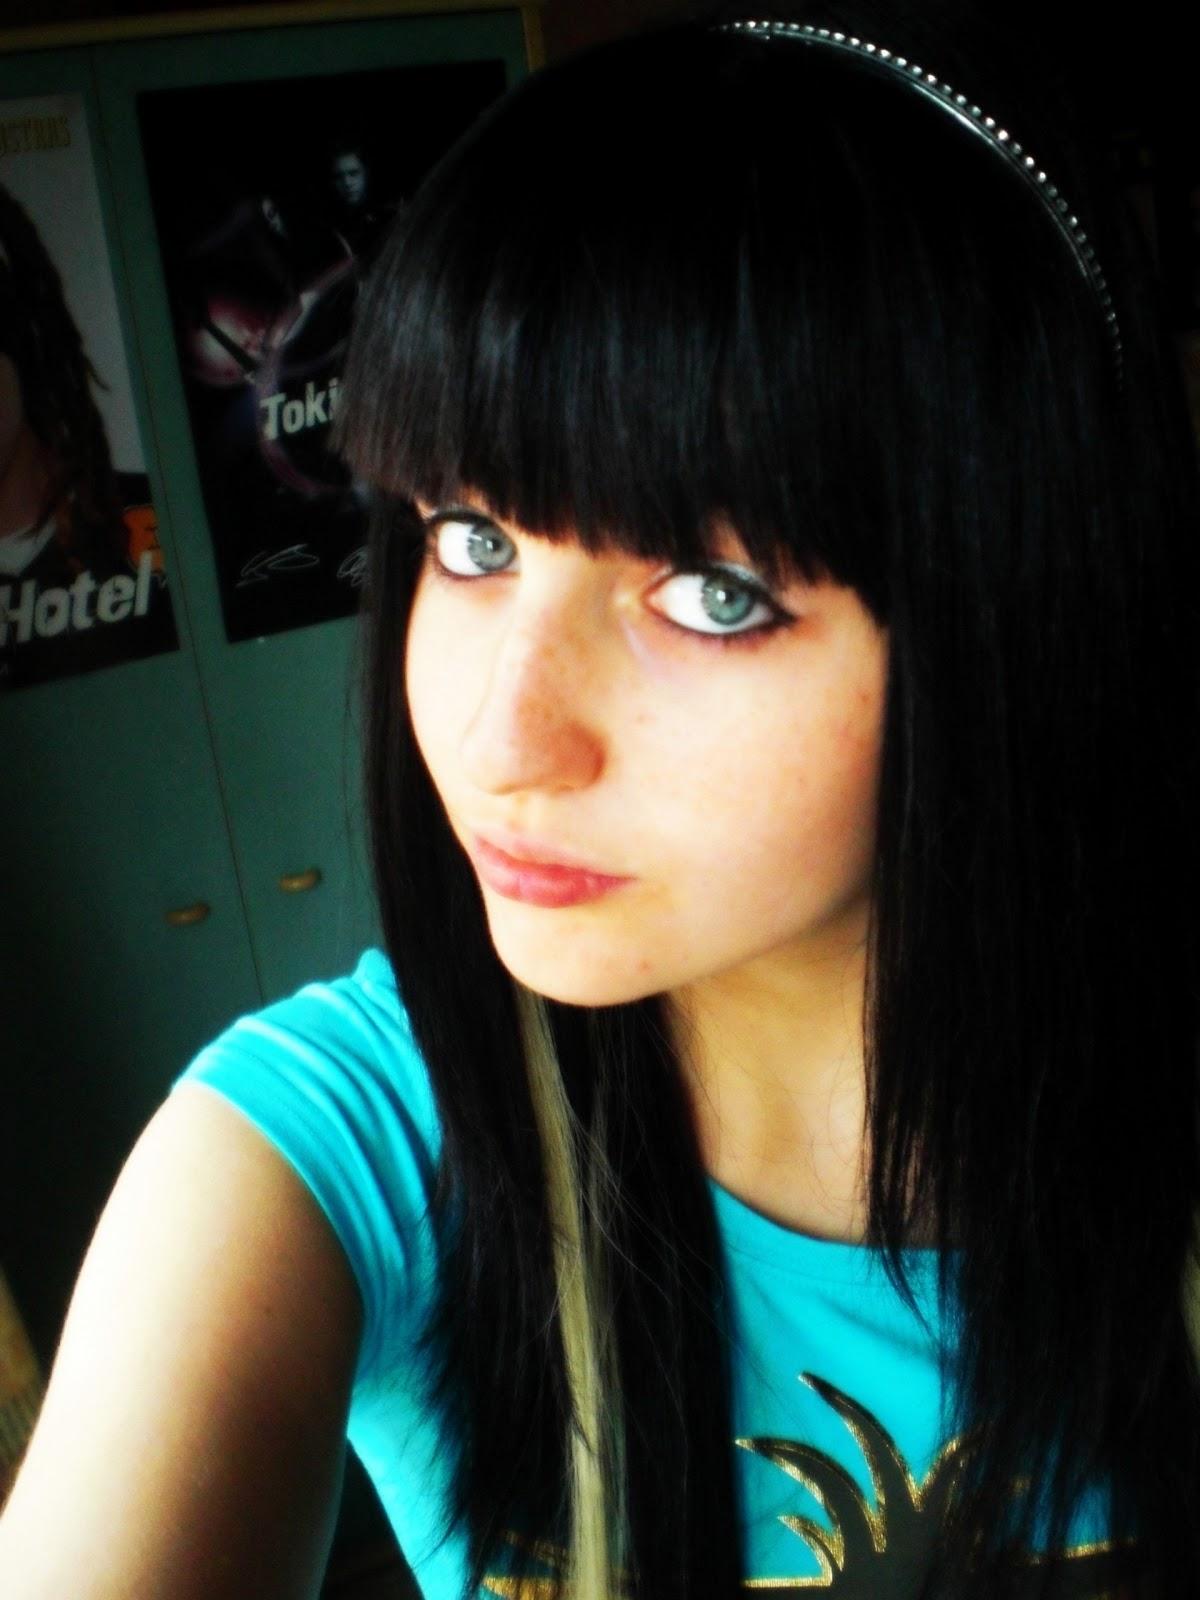 emo girl wallpapers emo girl wallpapers emo girl wallpapers emo girl 1200x1600